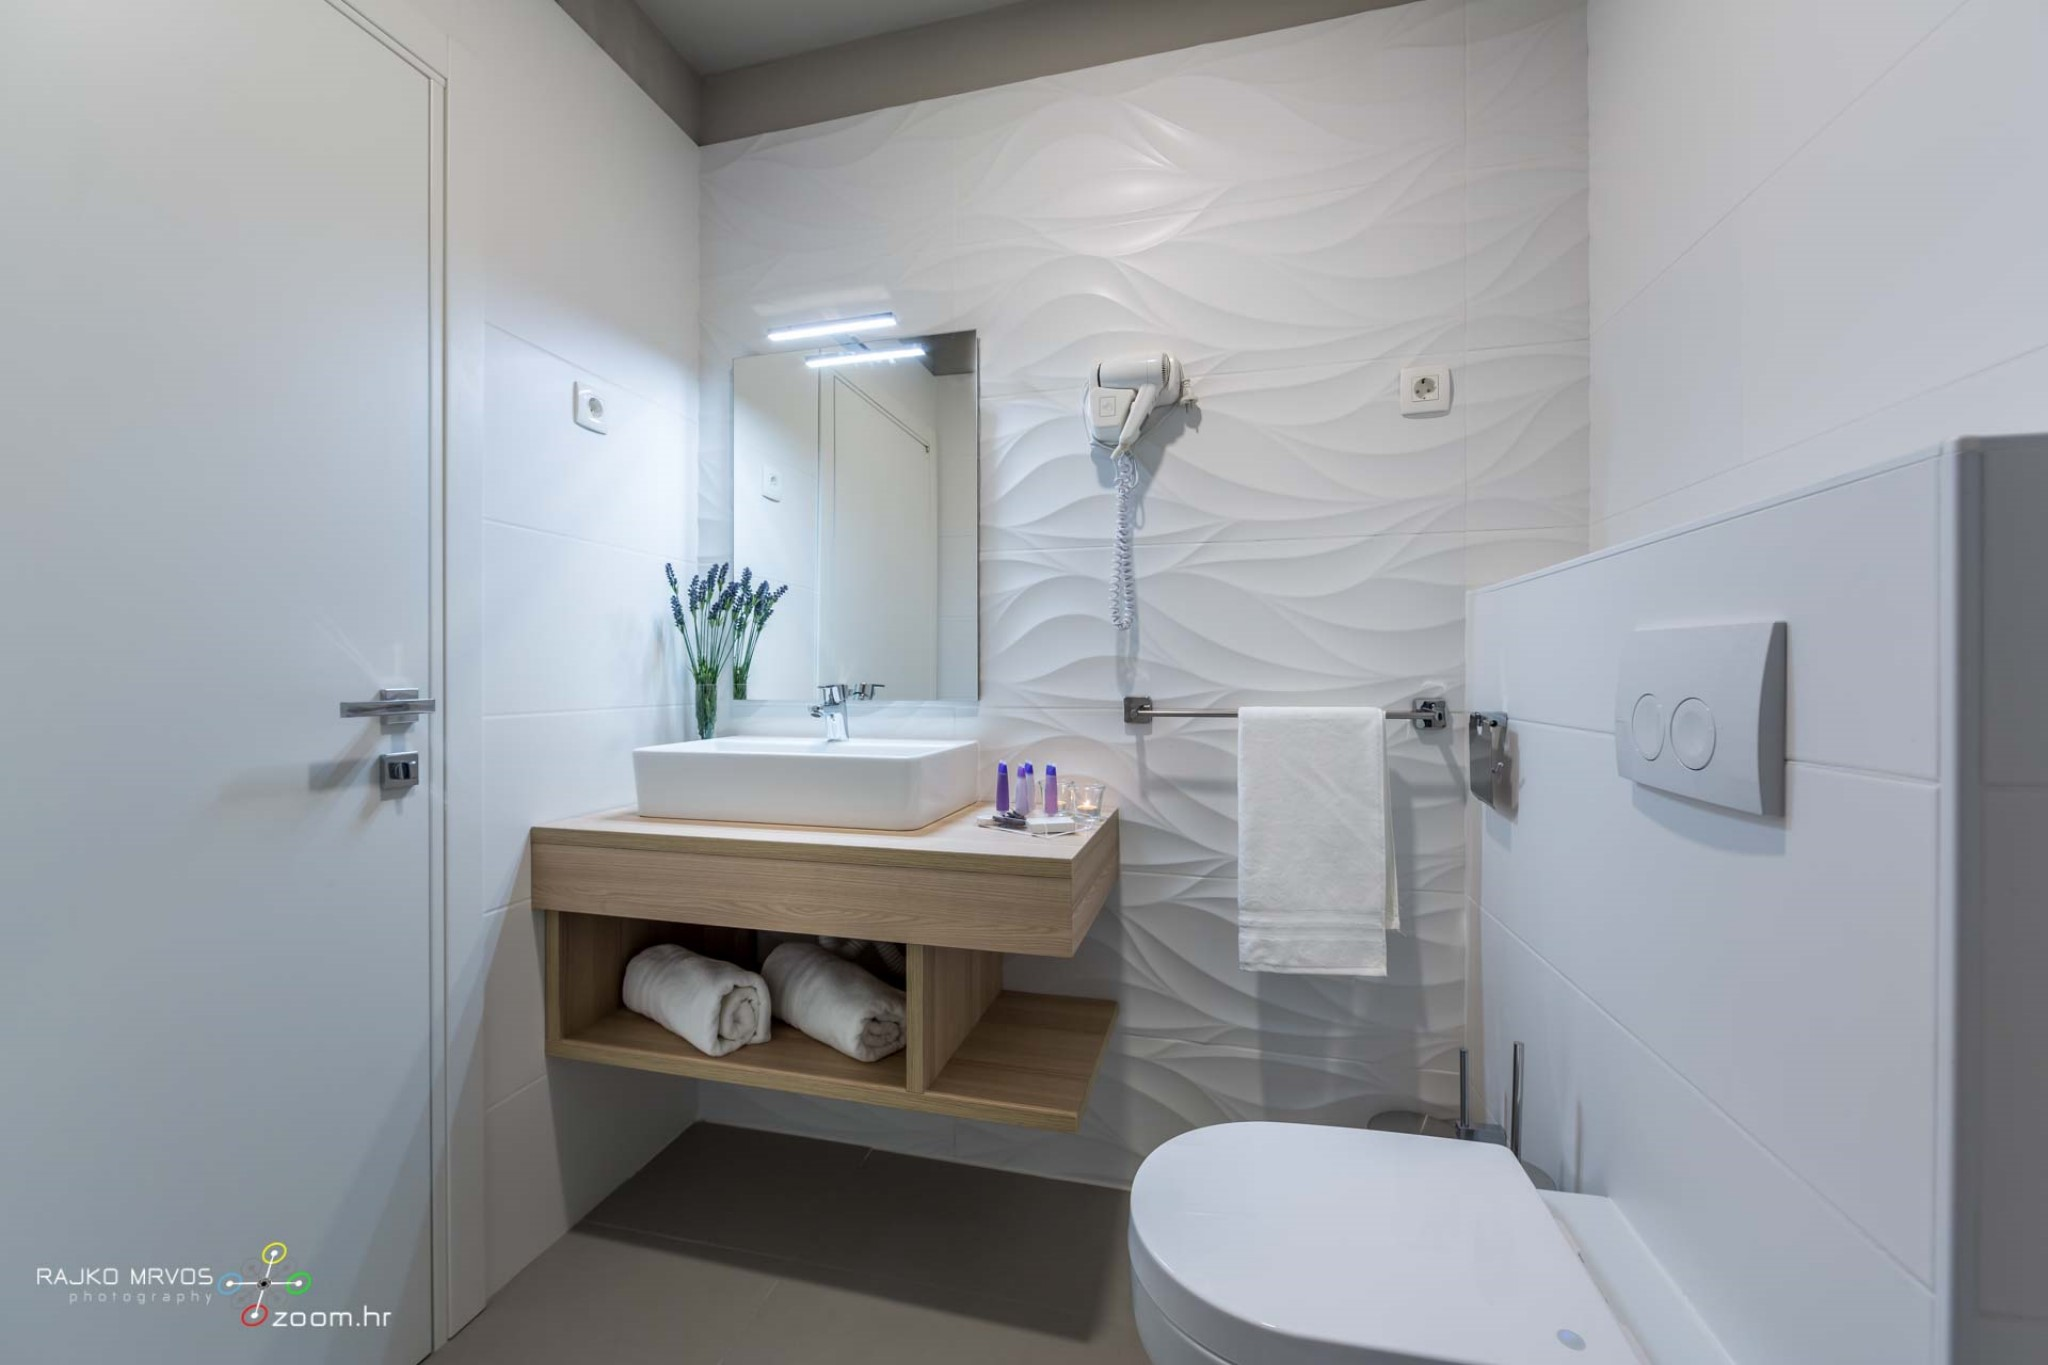 fotografiranje-interijera-fotograf-eksterijera-apartmana-vila-kuca-apartmani-Preelook-75